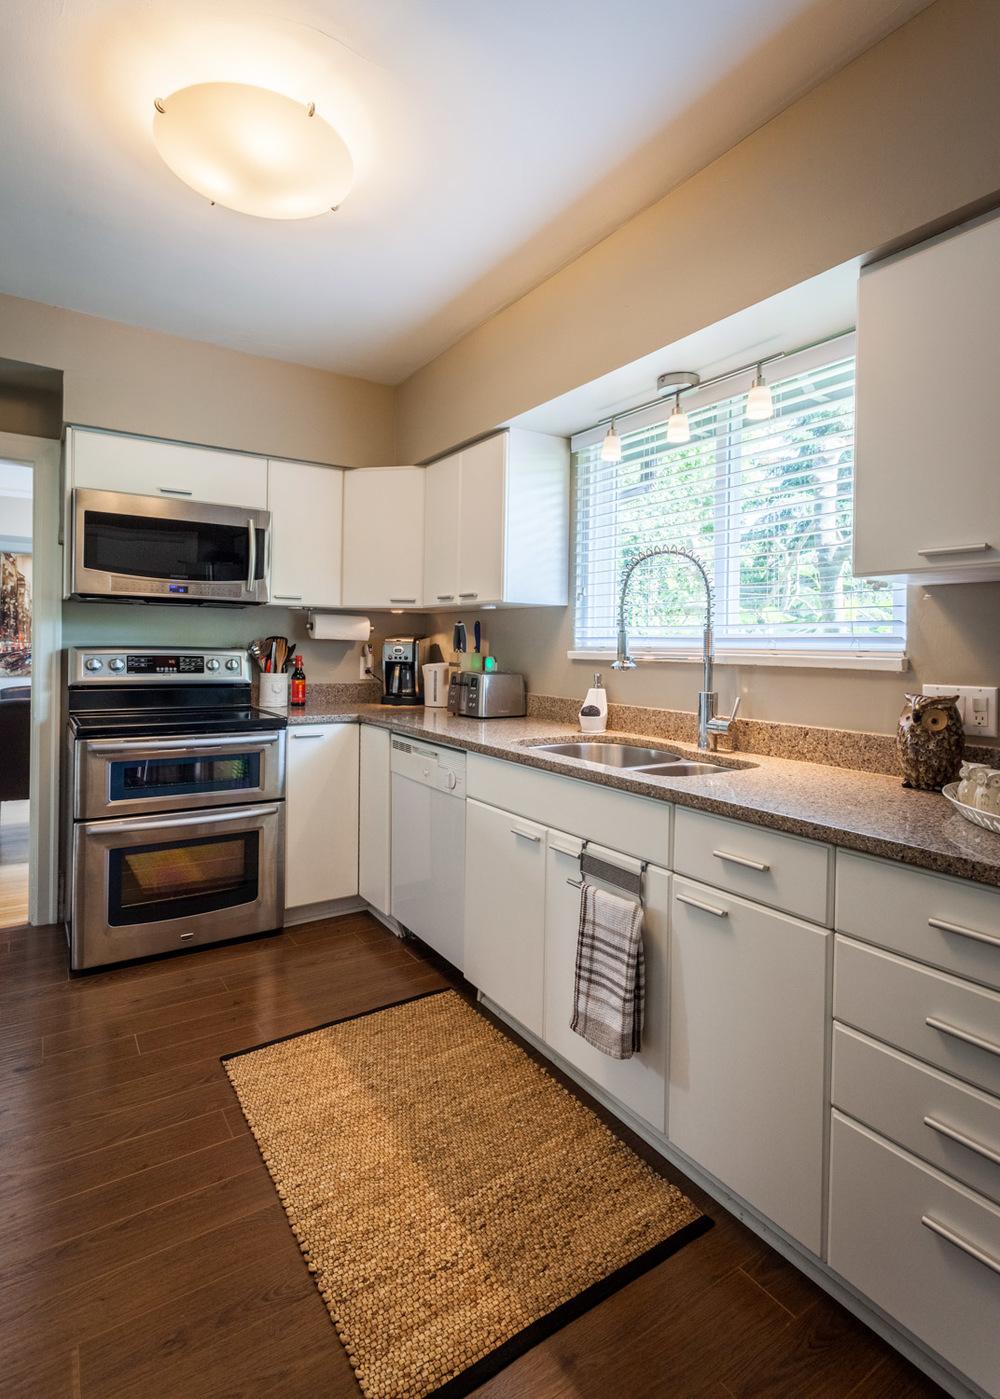 8 main_kitchen_1_MG_4644-HDR.jpg